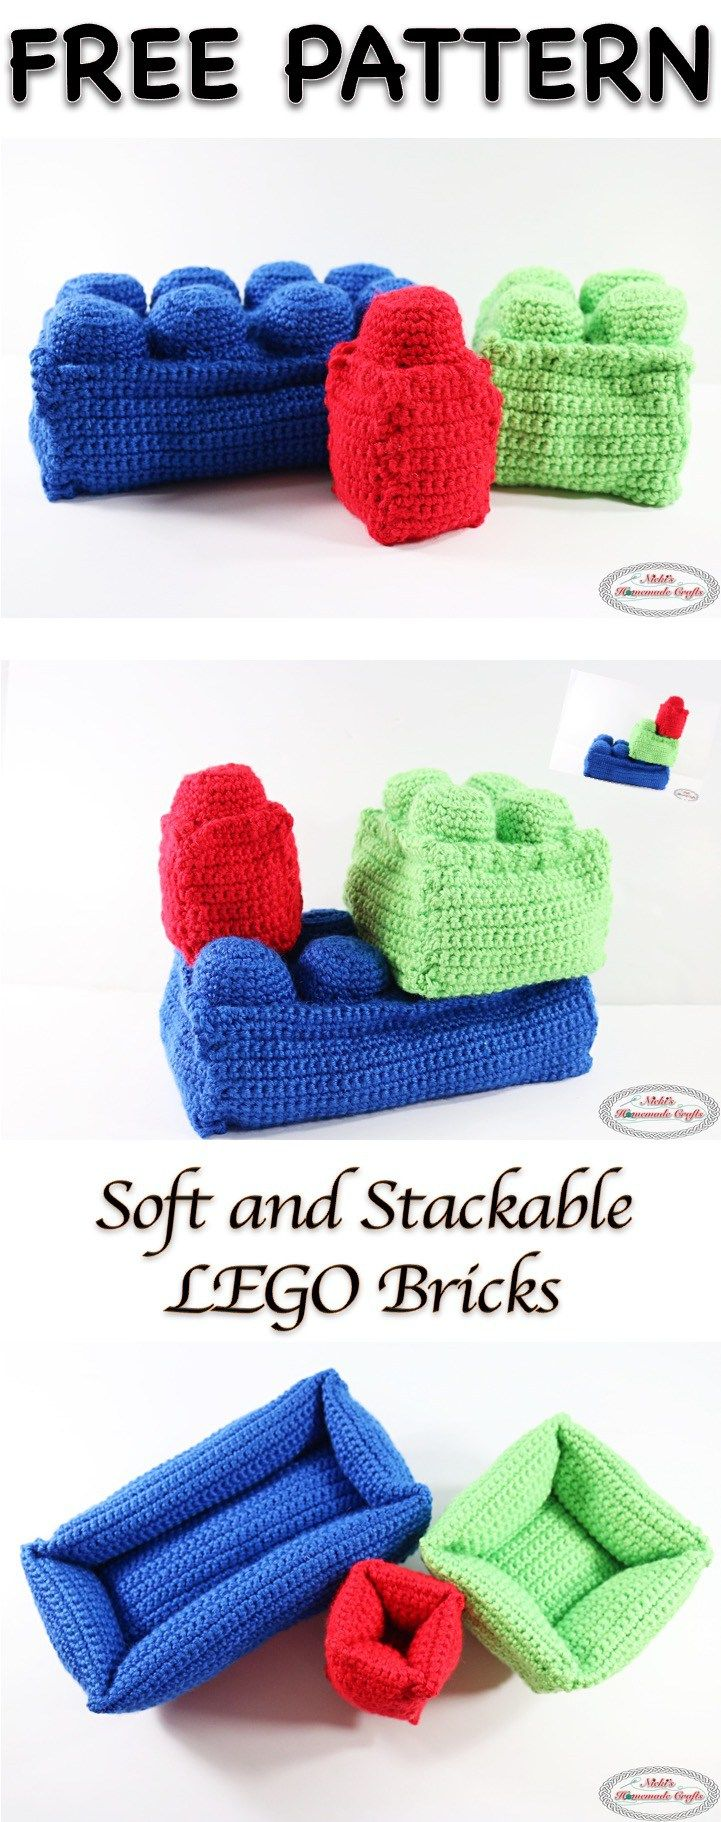 Lego Bricks - Free Crochet Pattern